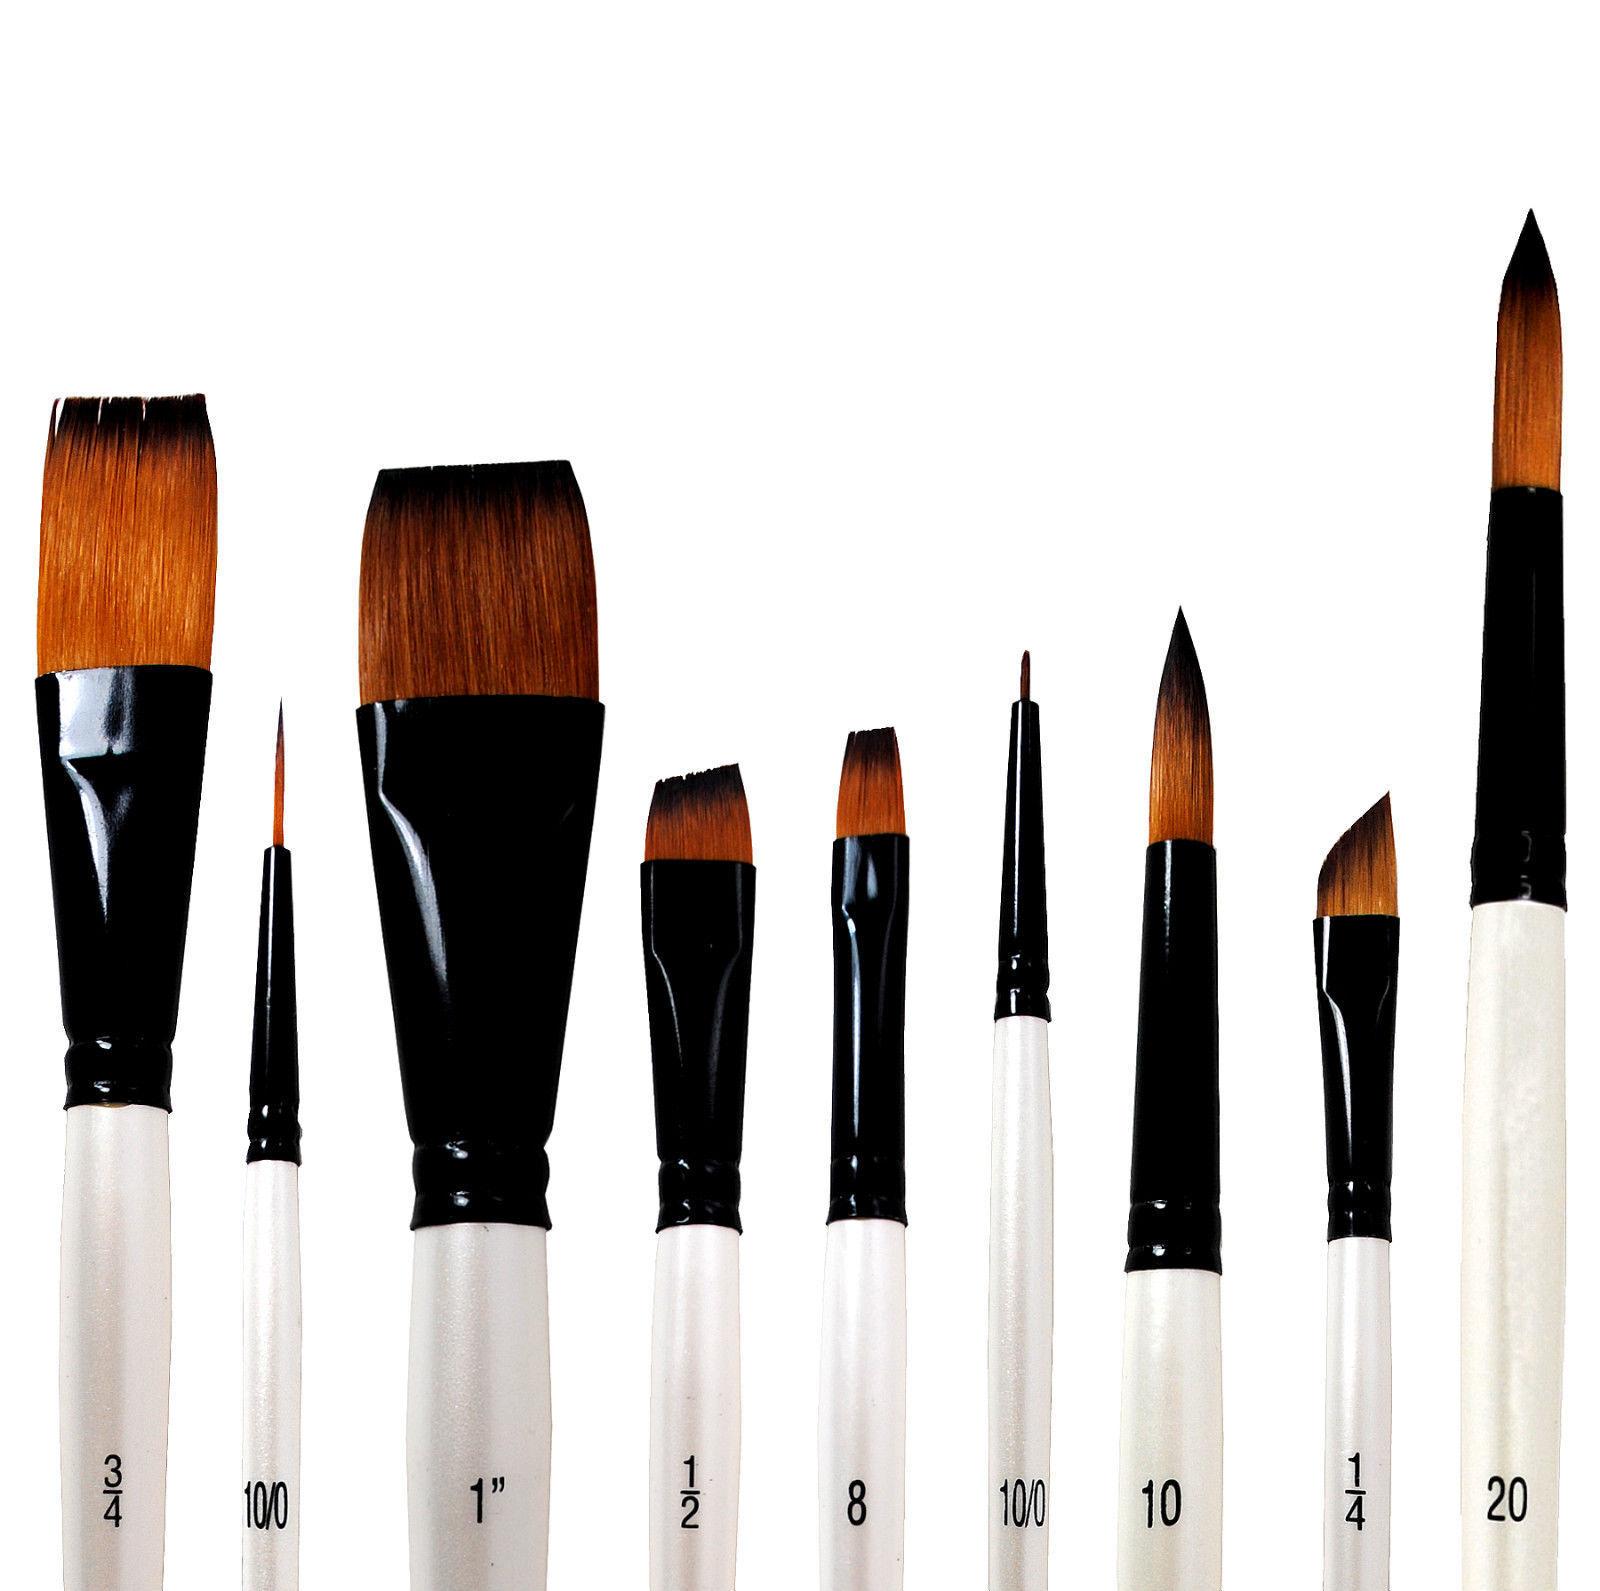 Graduate Paint Brush Sizes